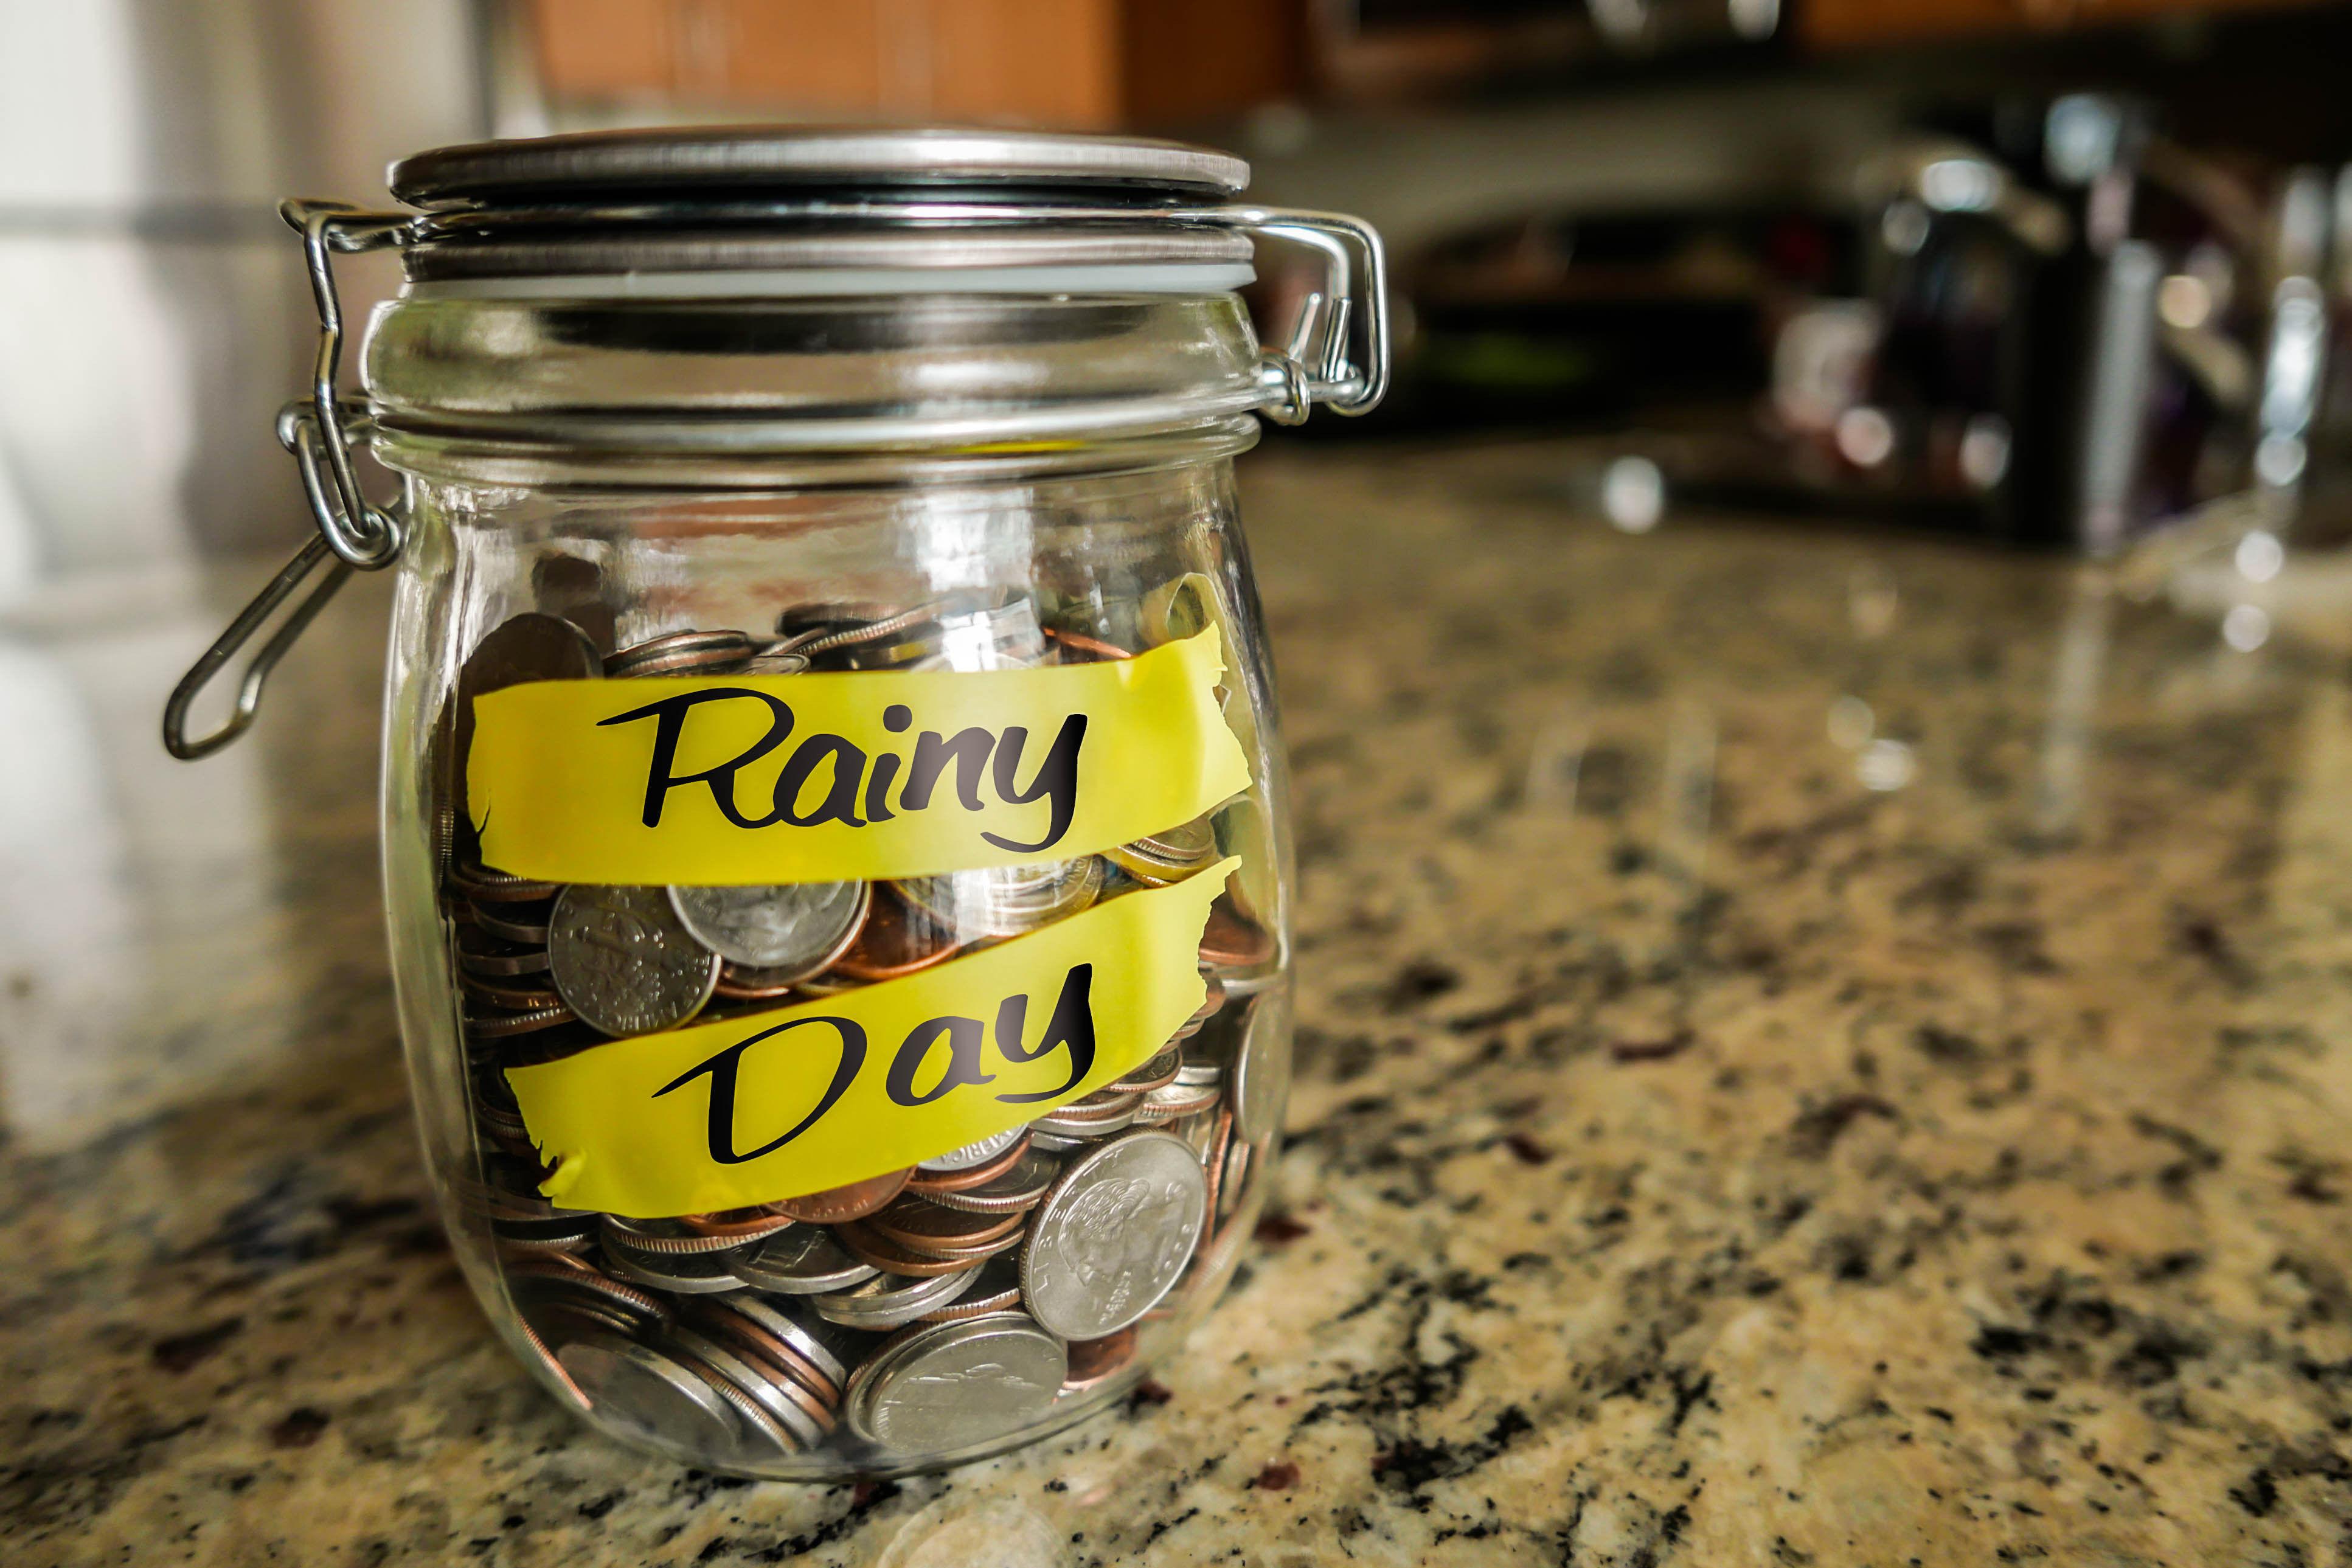 Rainy day fund acgmca